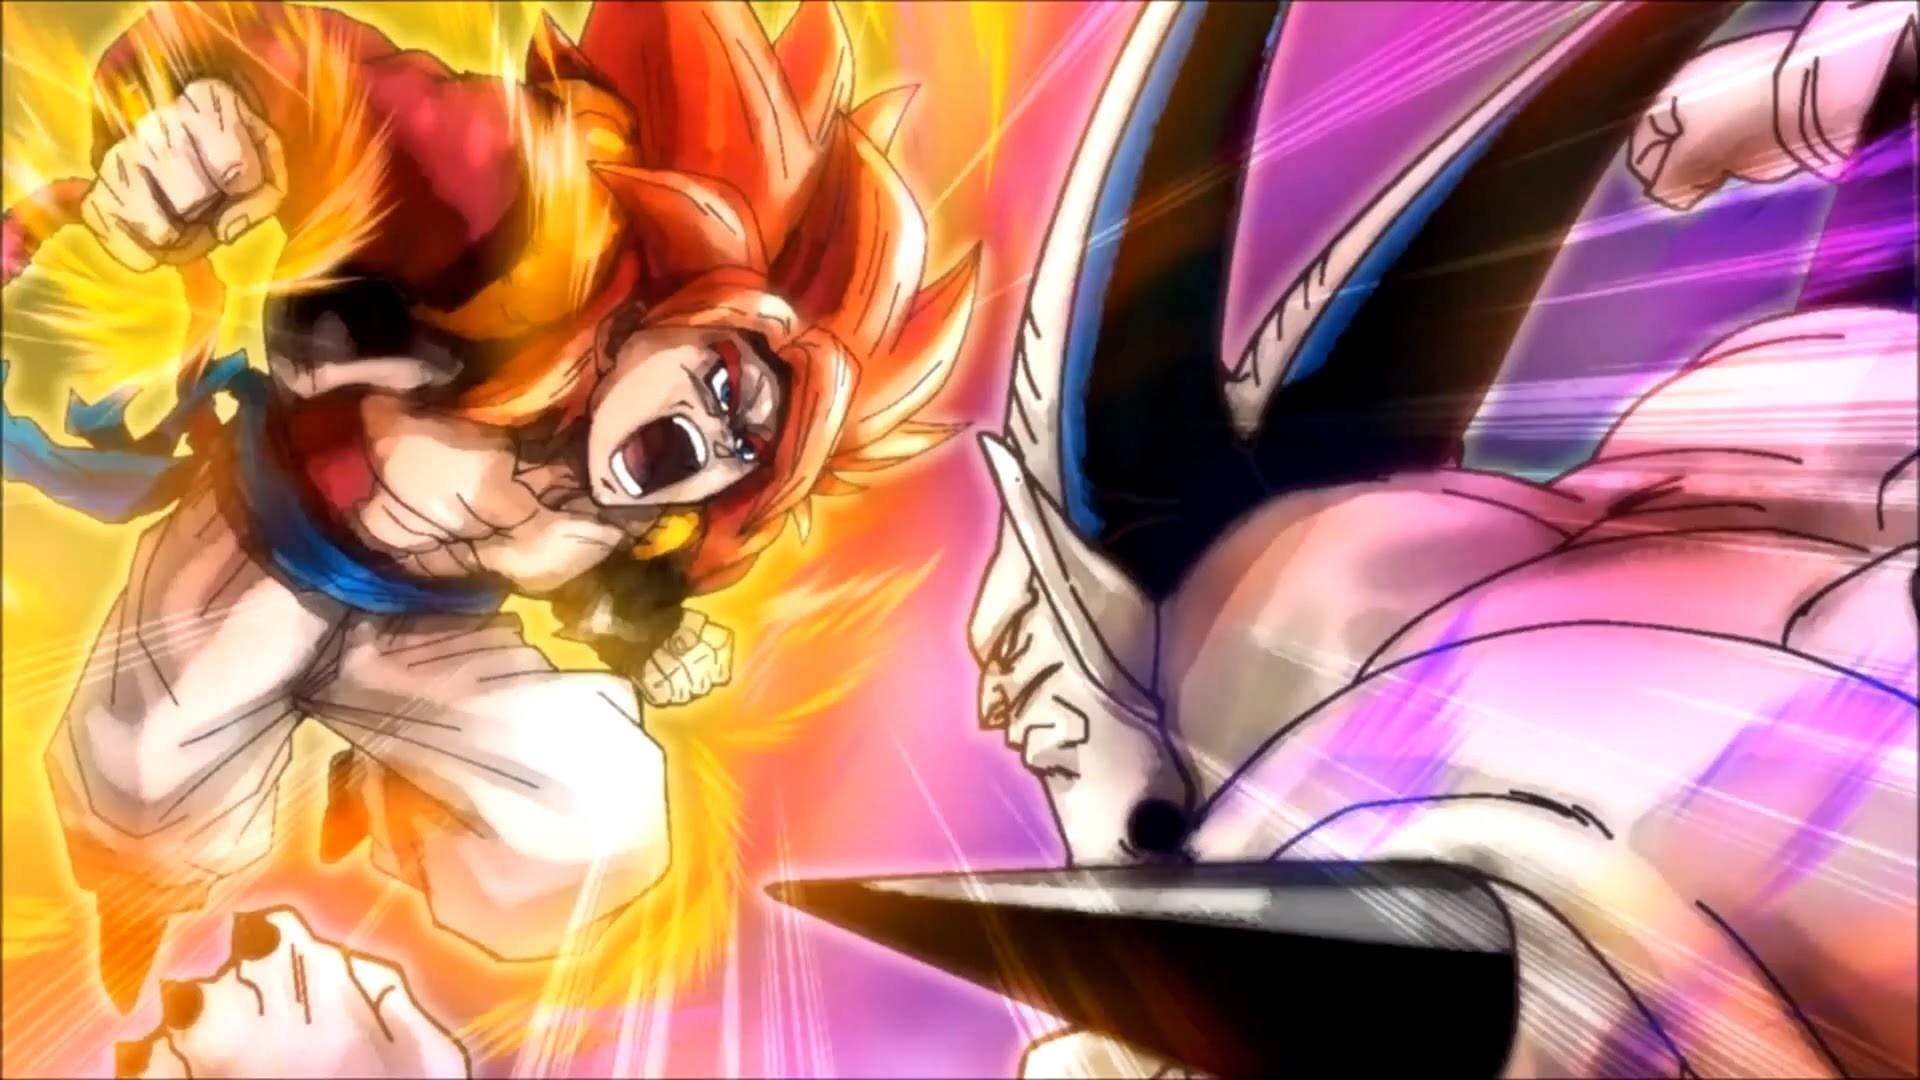 SS4 Gogeta, Omega Shenron vs Beerus, SSG Goku – Battles – Comic Vine